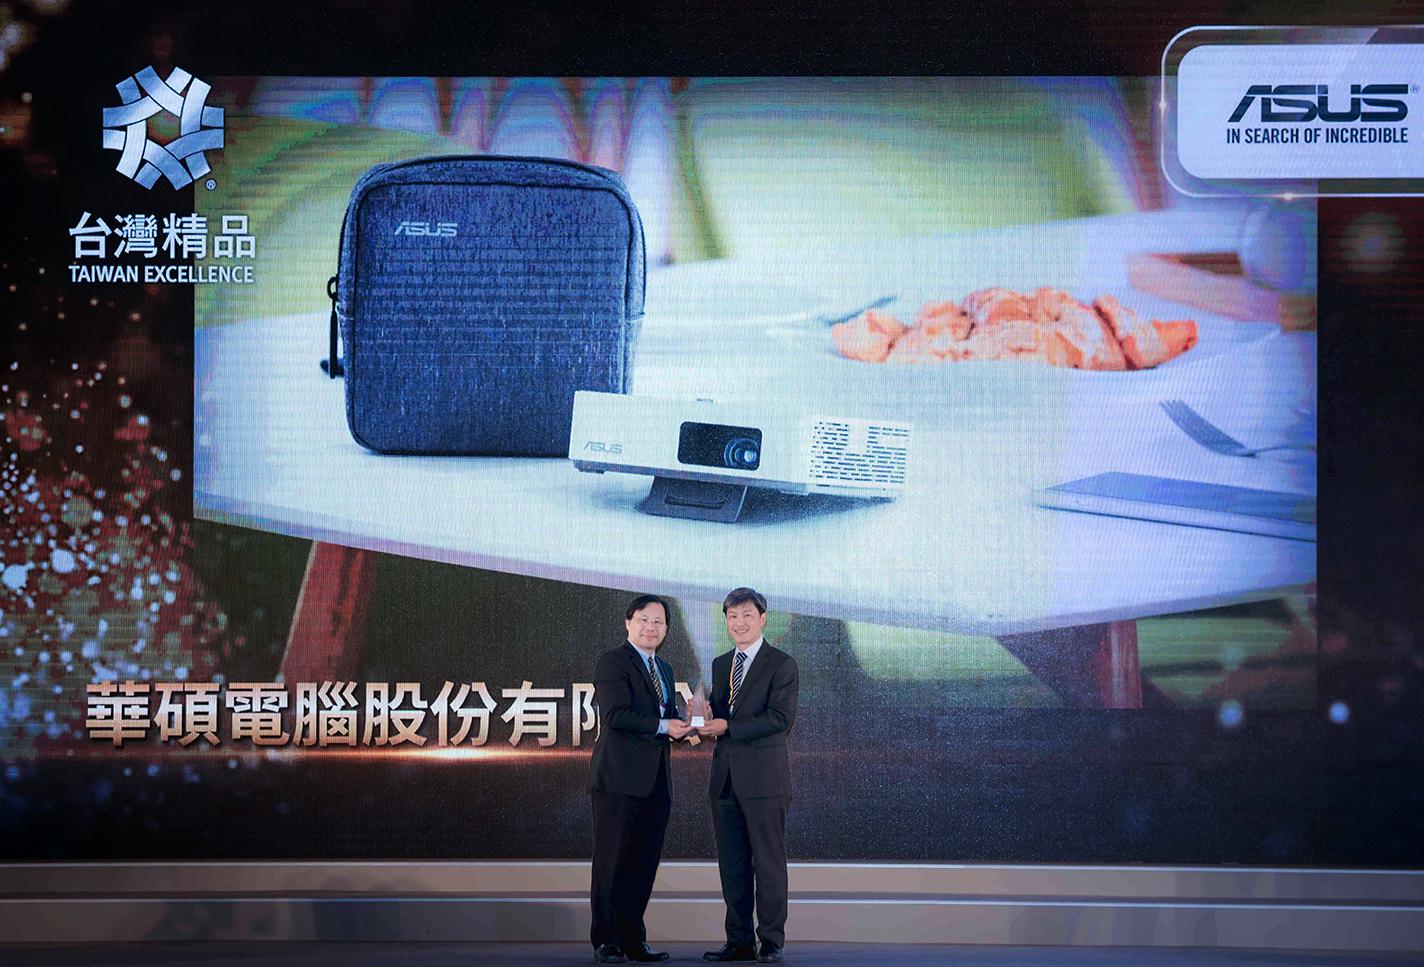 ASUS ZenBeam S2 可攜式投影機輕巧體積採用環保的無汞LED燈源,以及優異的短焦投影特色,獲頒台灣精品獎銀質獎